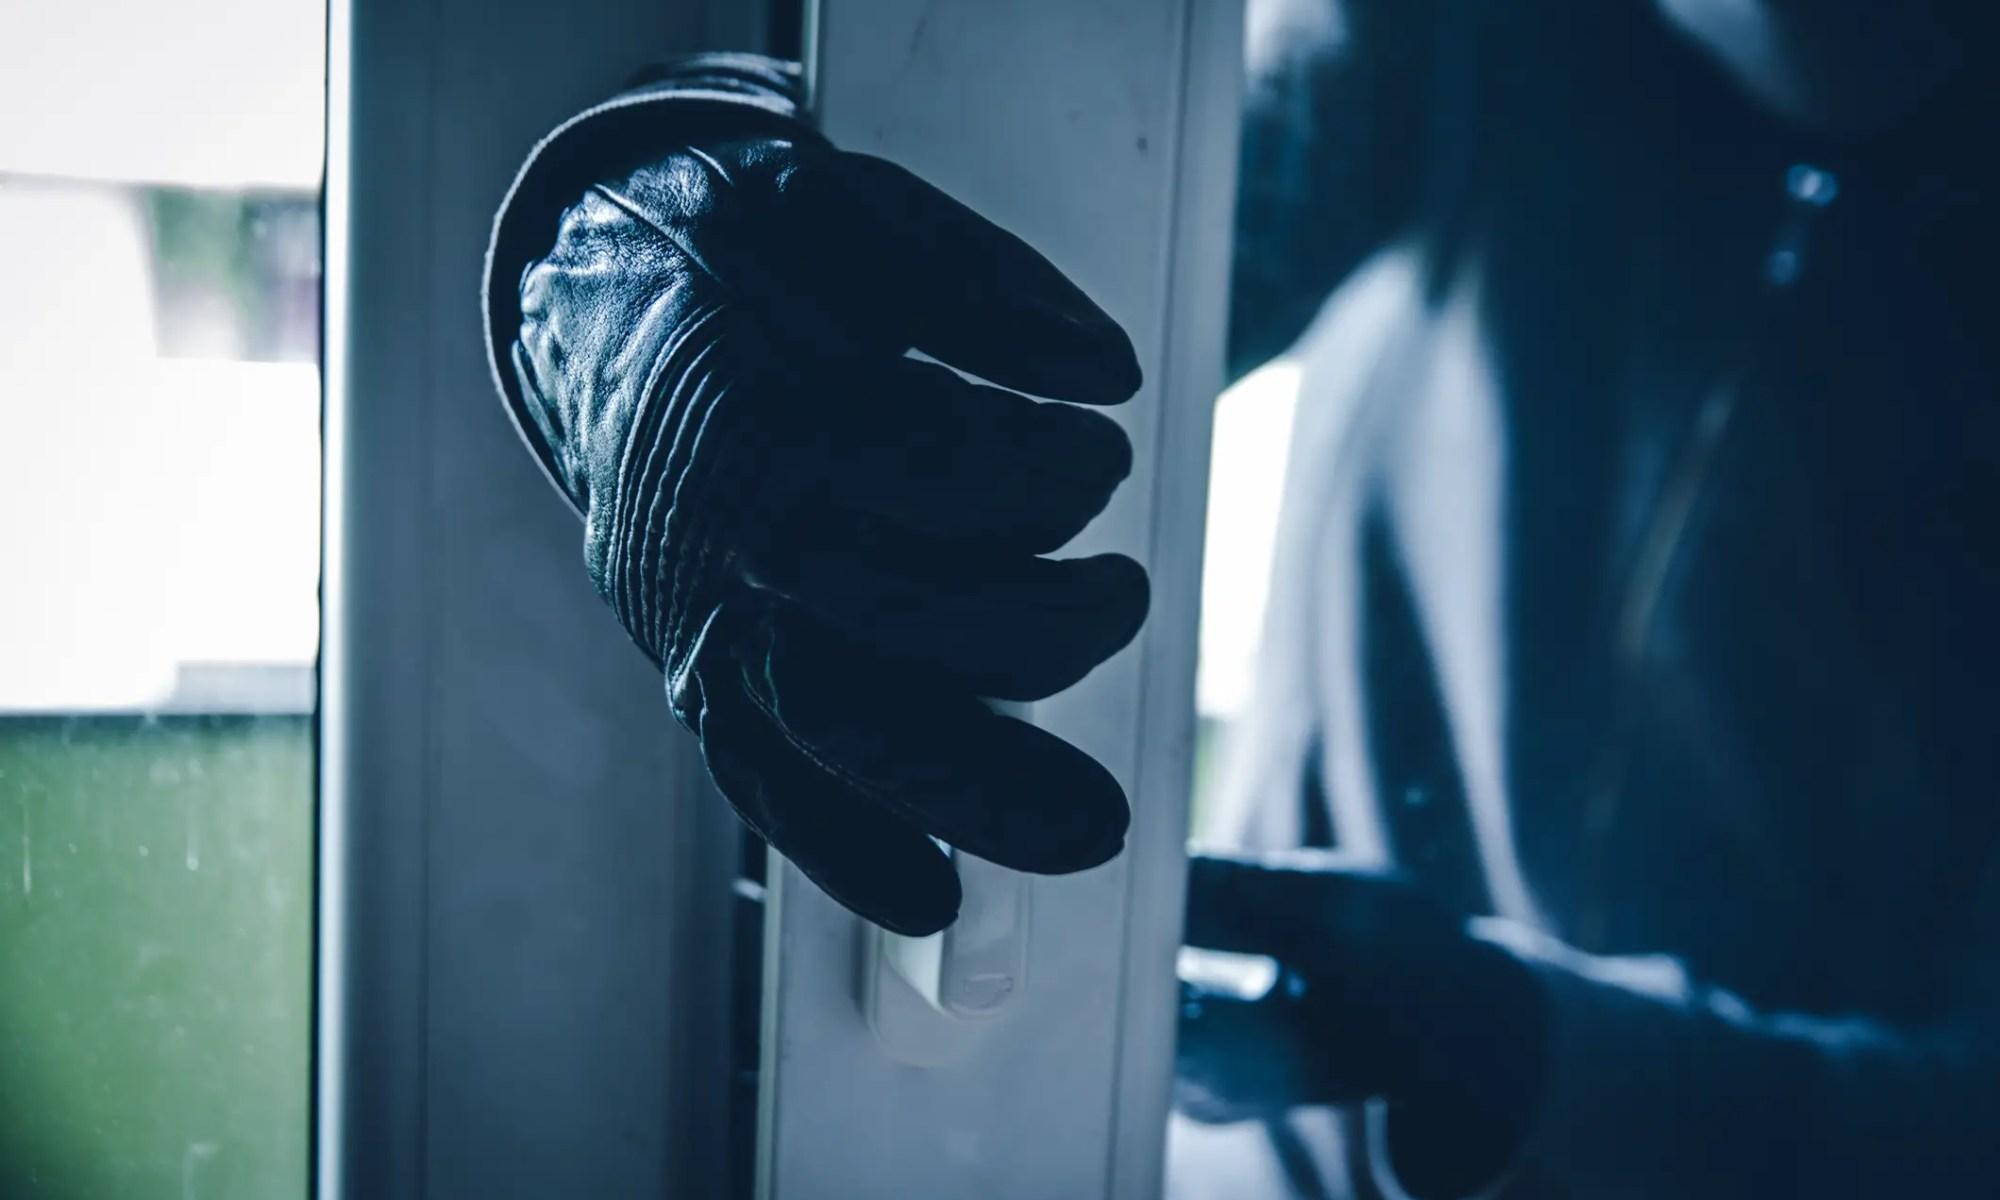 Burglar breaking into a home